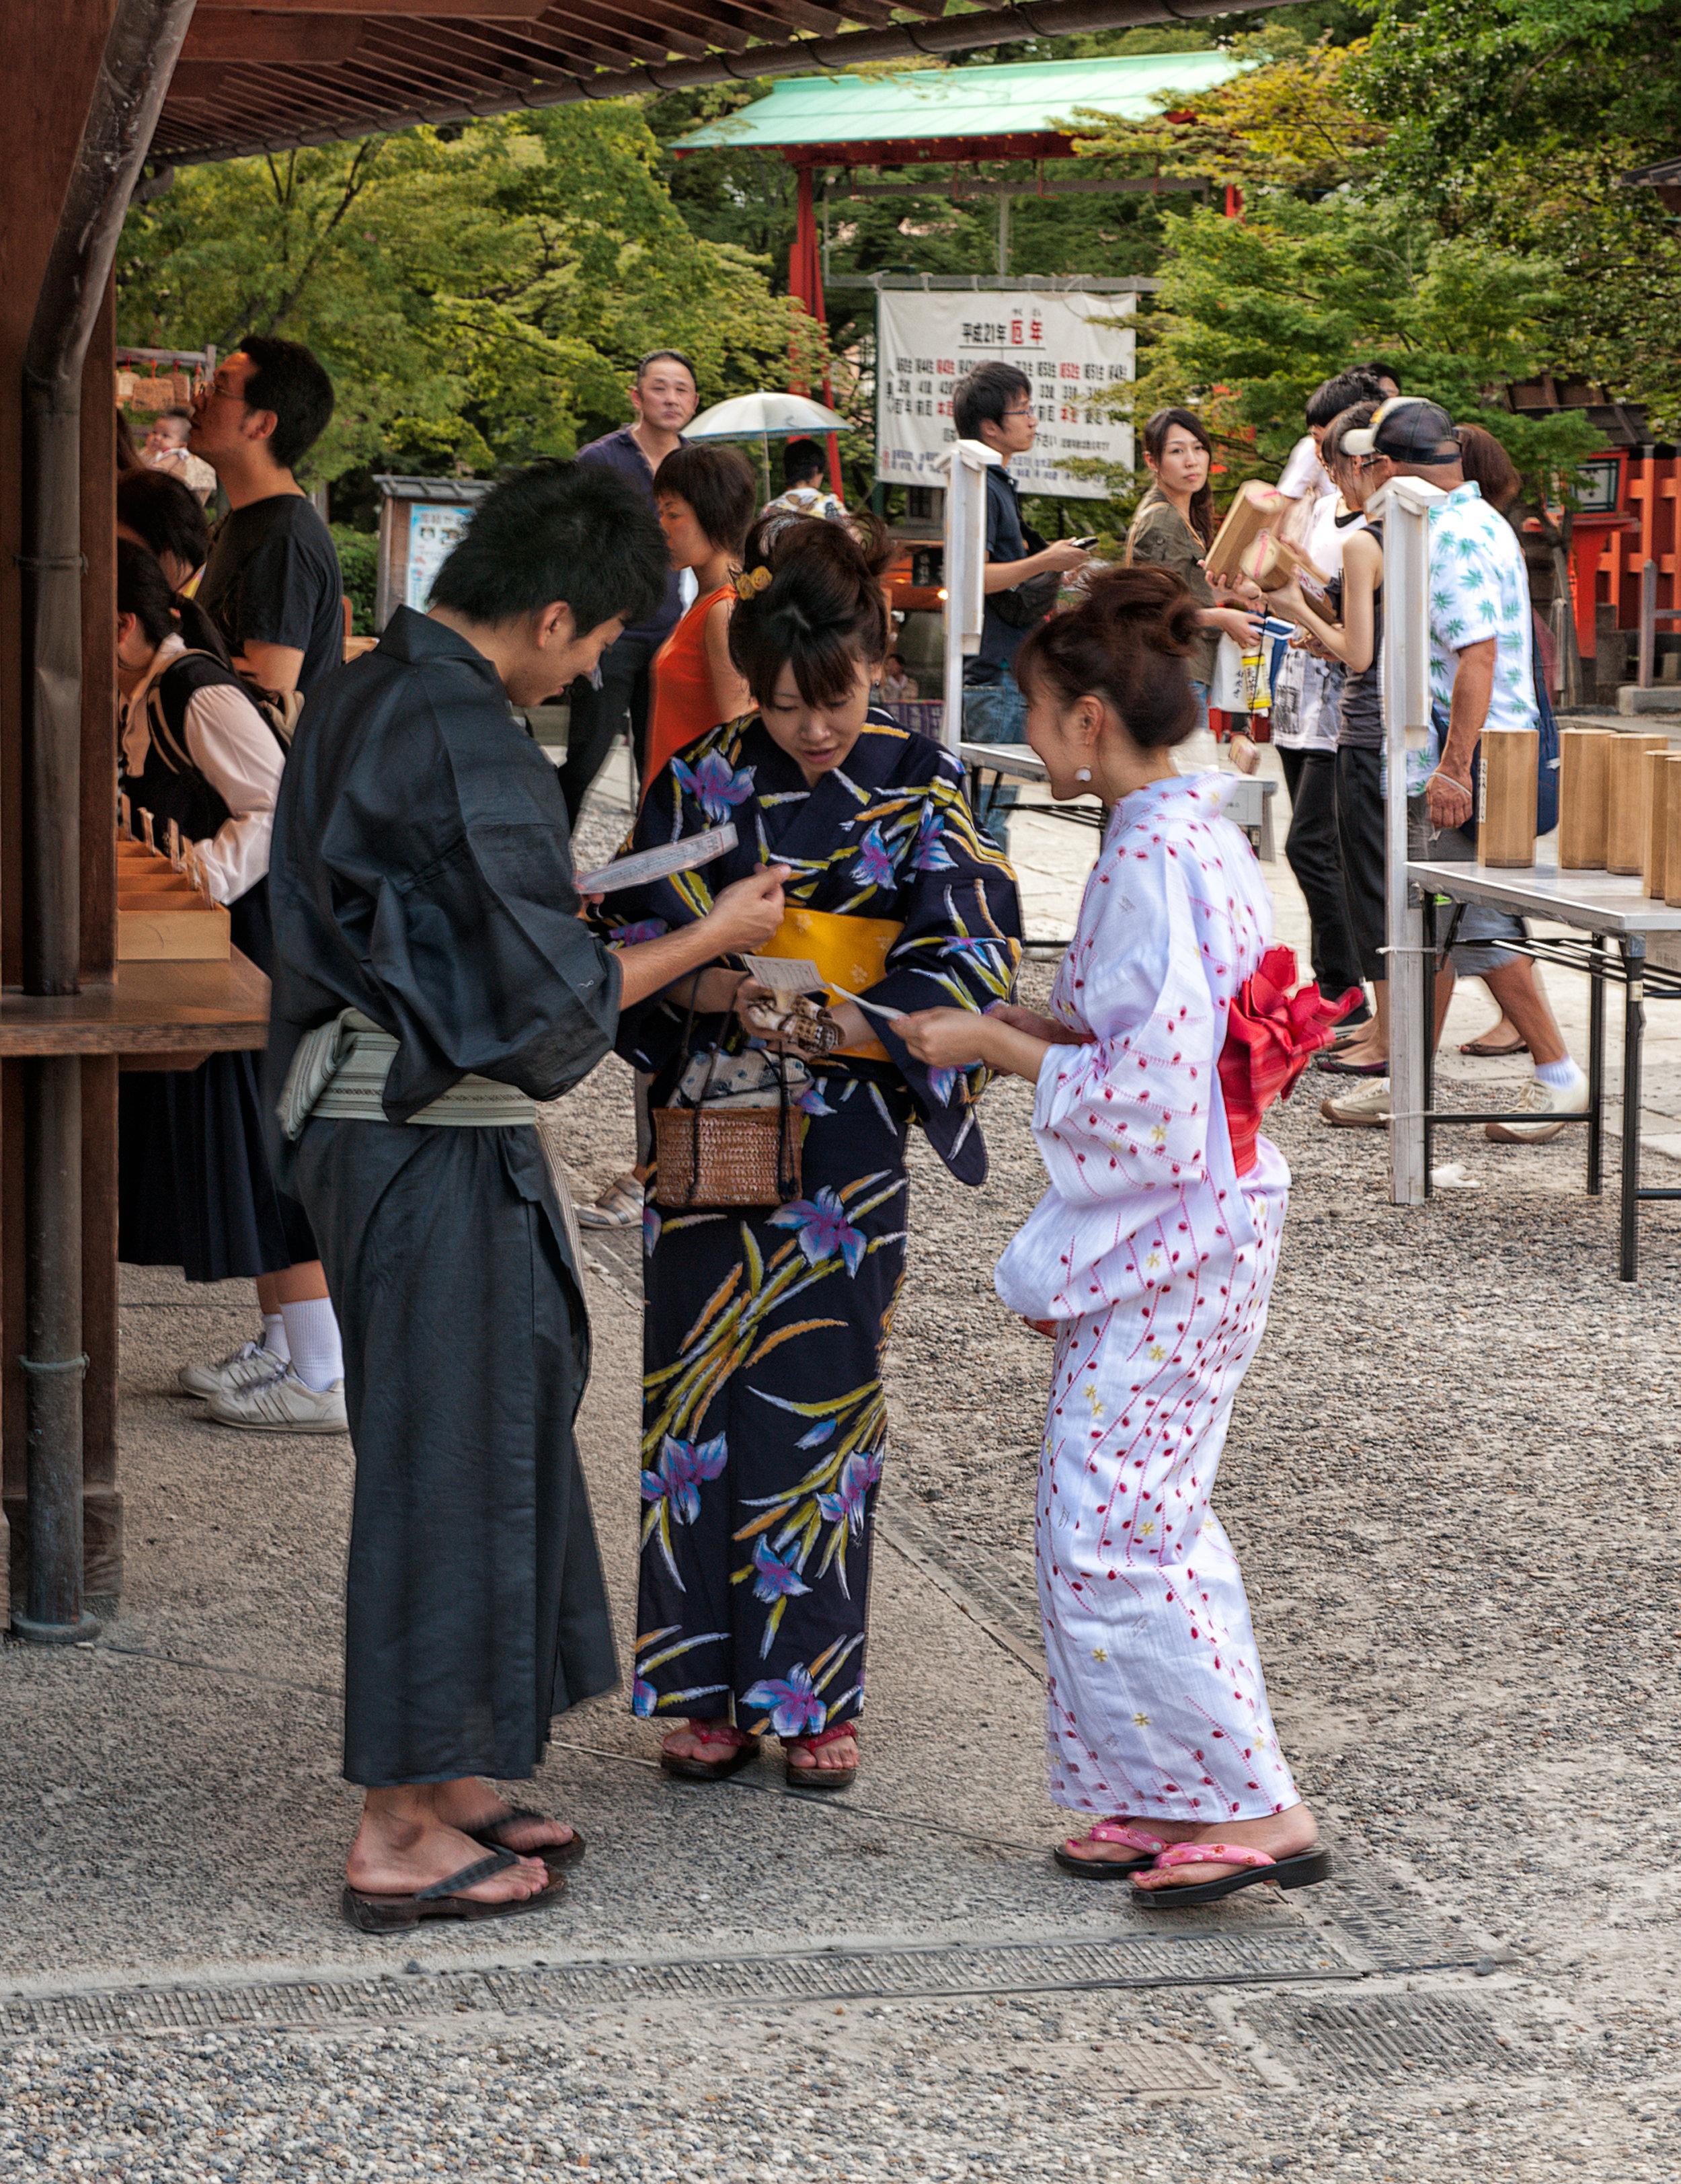 Japan-John Bardell-0337a.jpg